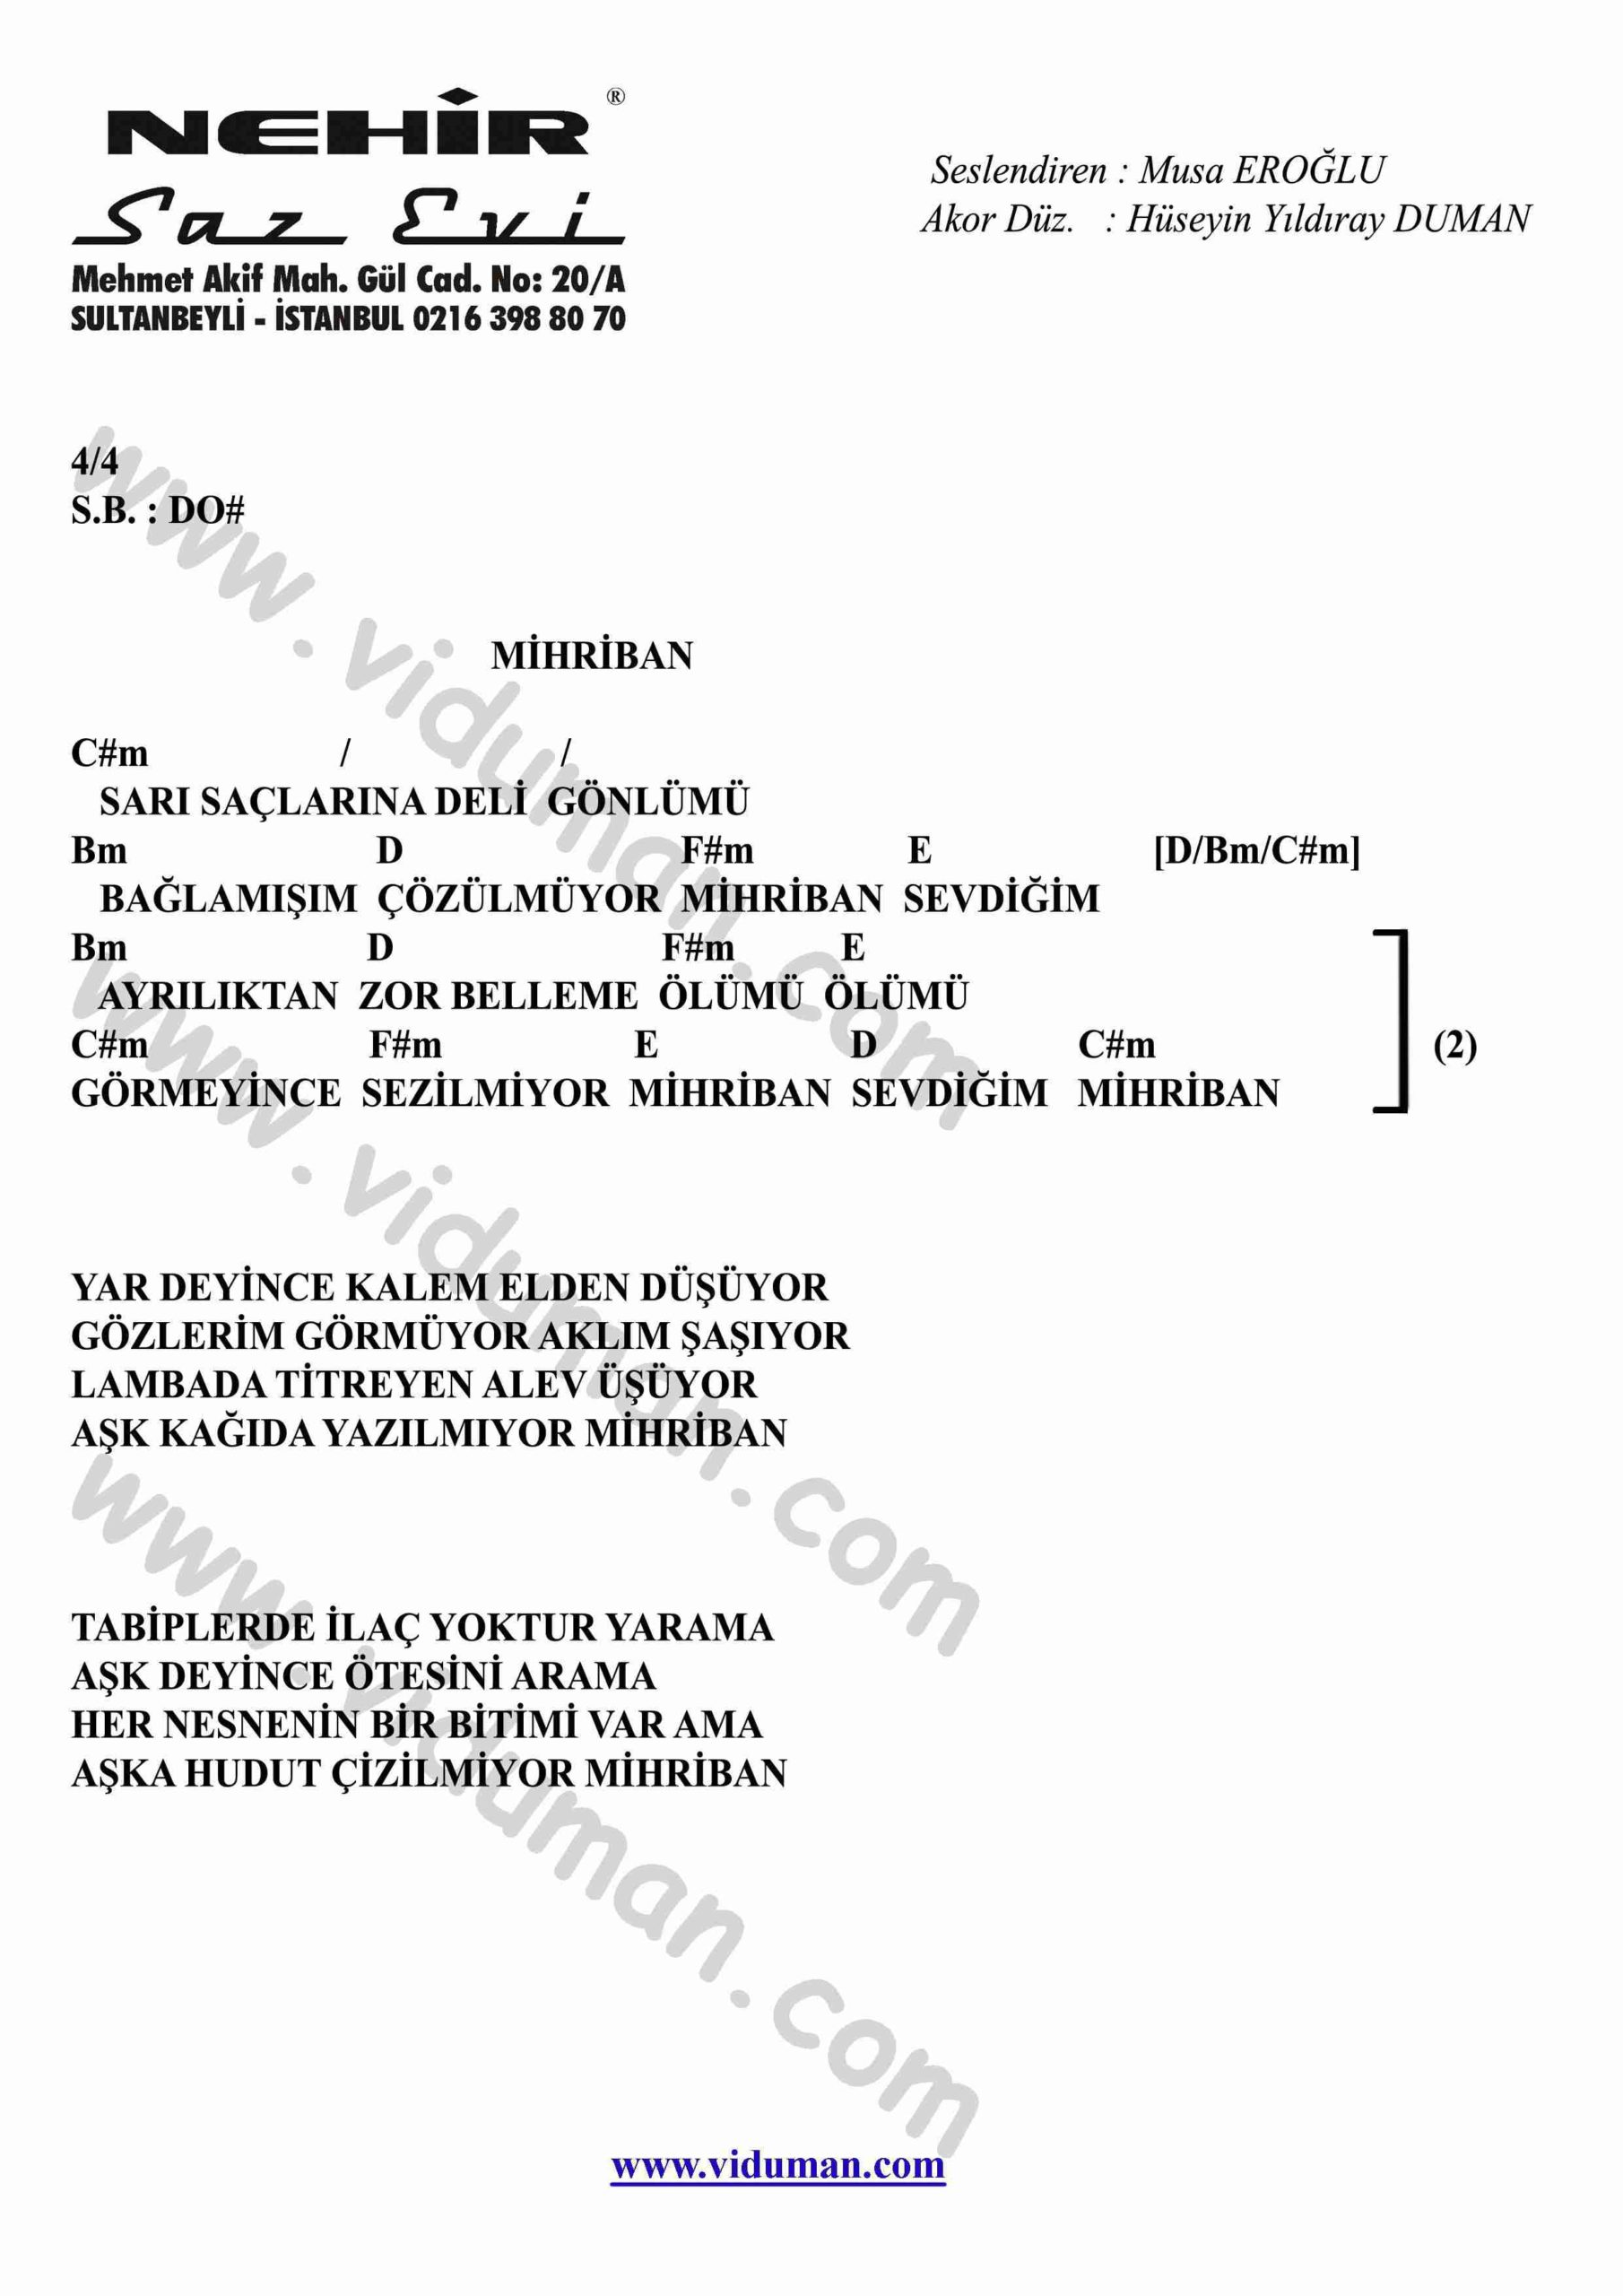 Mihriban-Gitar-Ritim-Akorlari